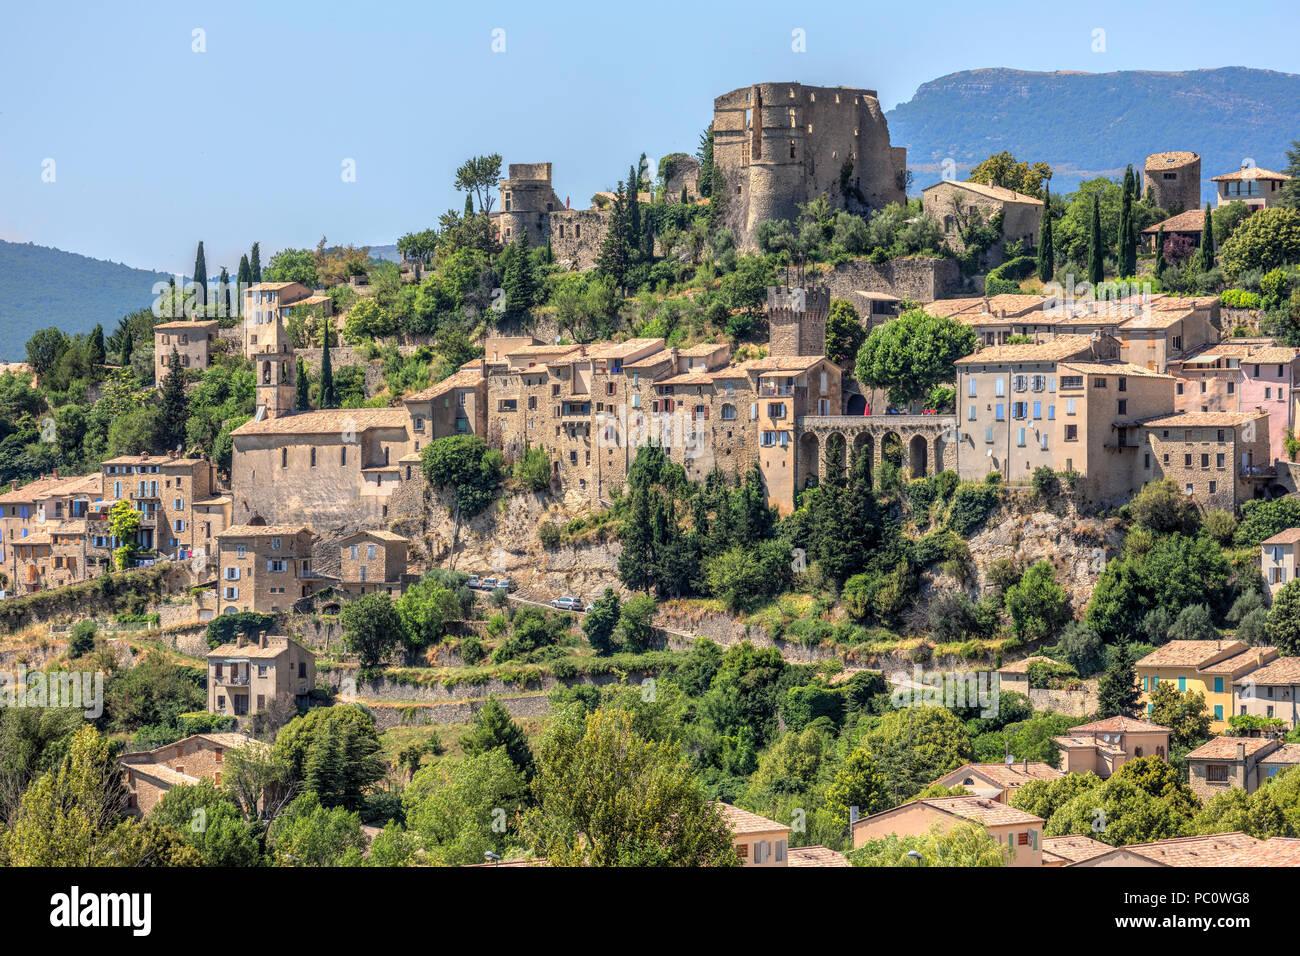 Montbrun-les-Bains, Drome, France, Europe - Stock Image